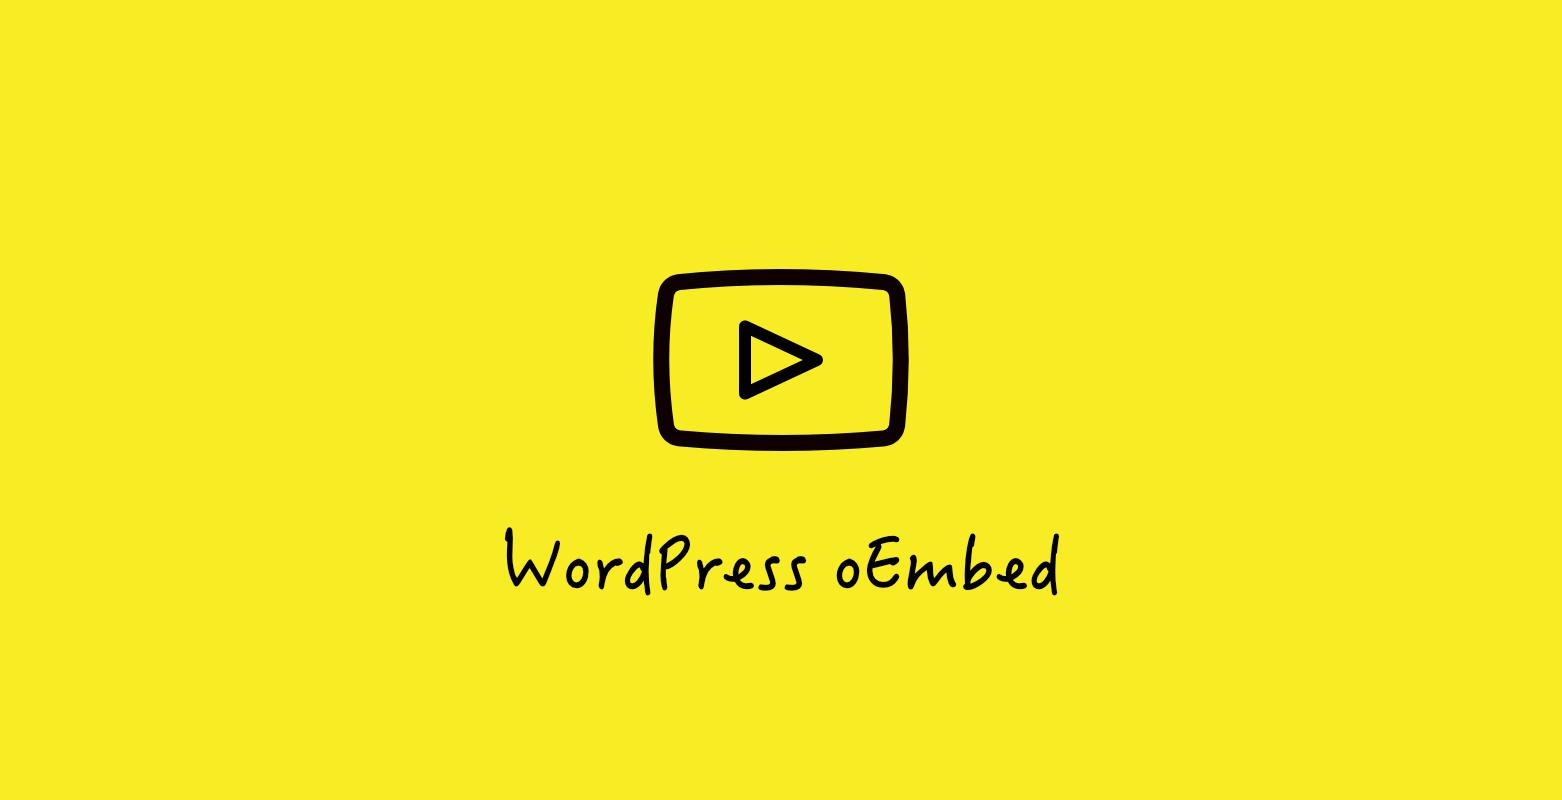 wordpress-oembed-youtube